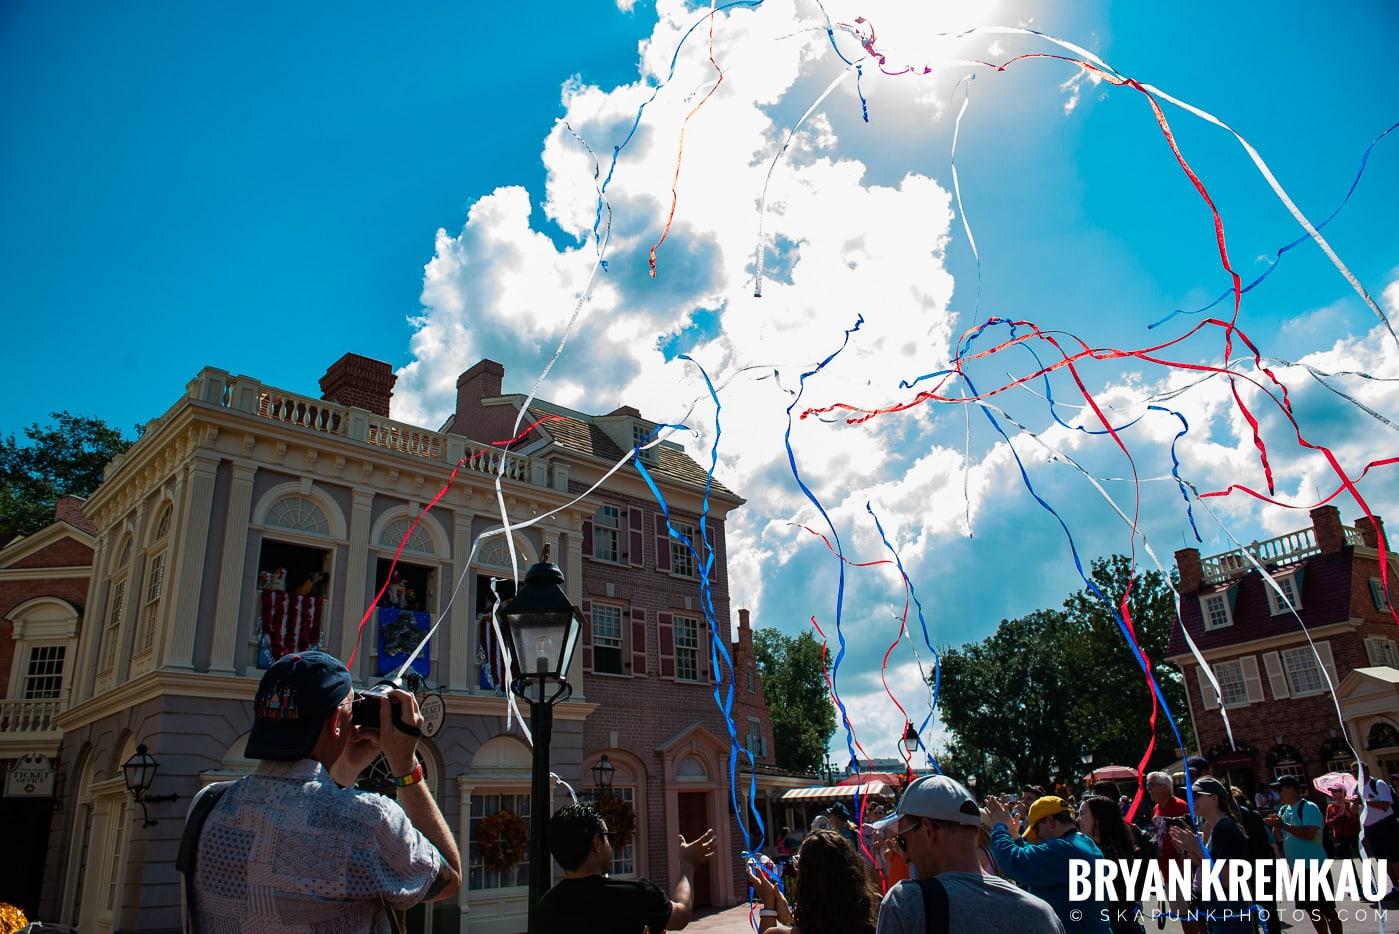 Walt Disney World Vacation: Days 1 & 2 (Disney Springs & Magic Kingdom, Epcot) September 29th - 30th 2019 (17)